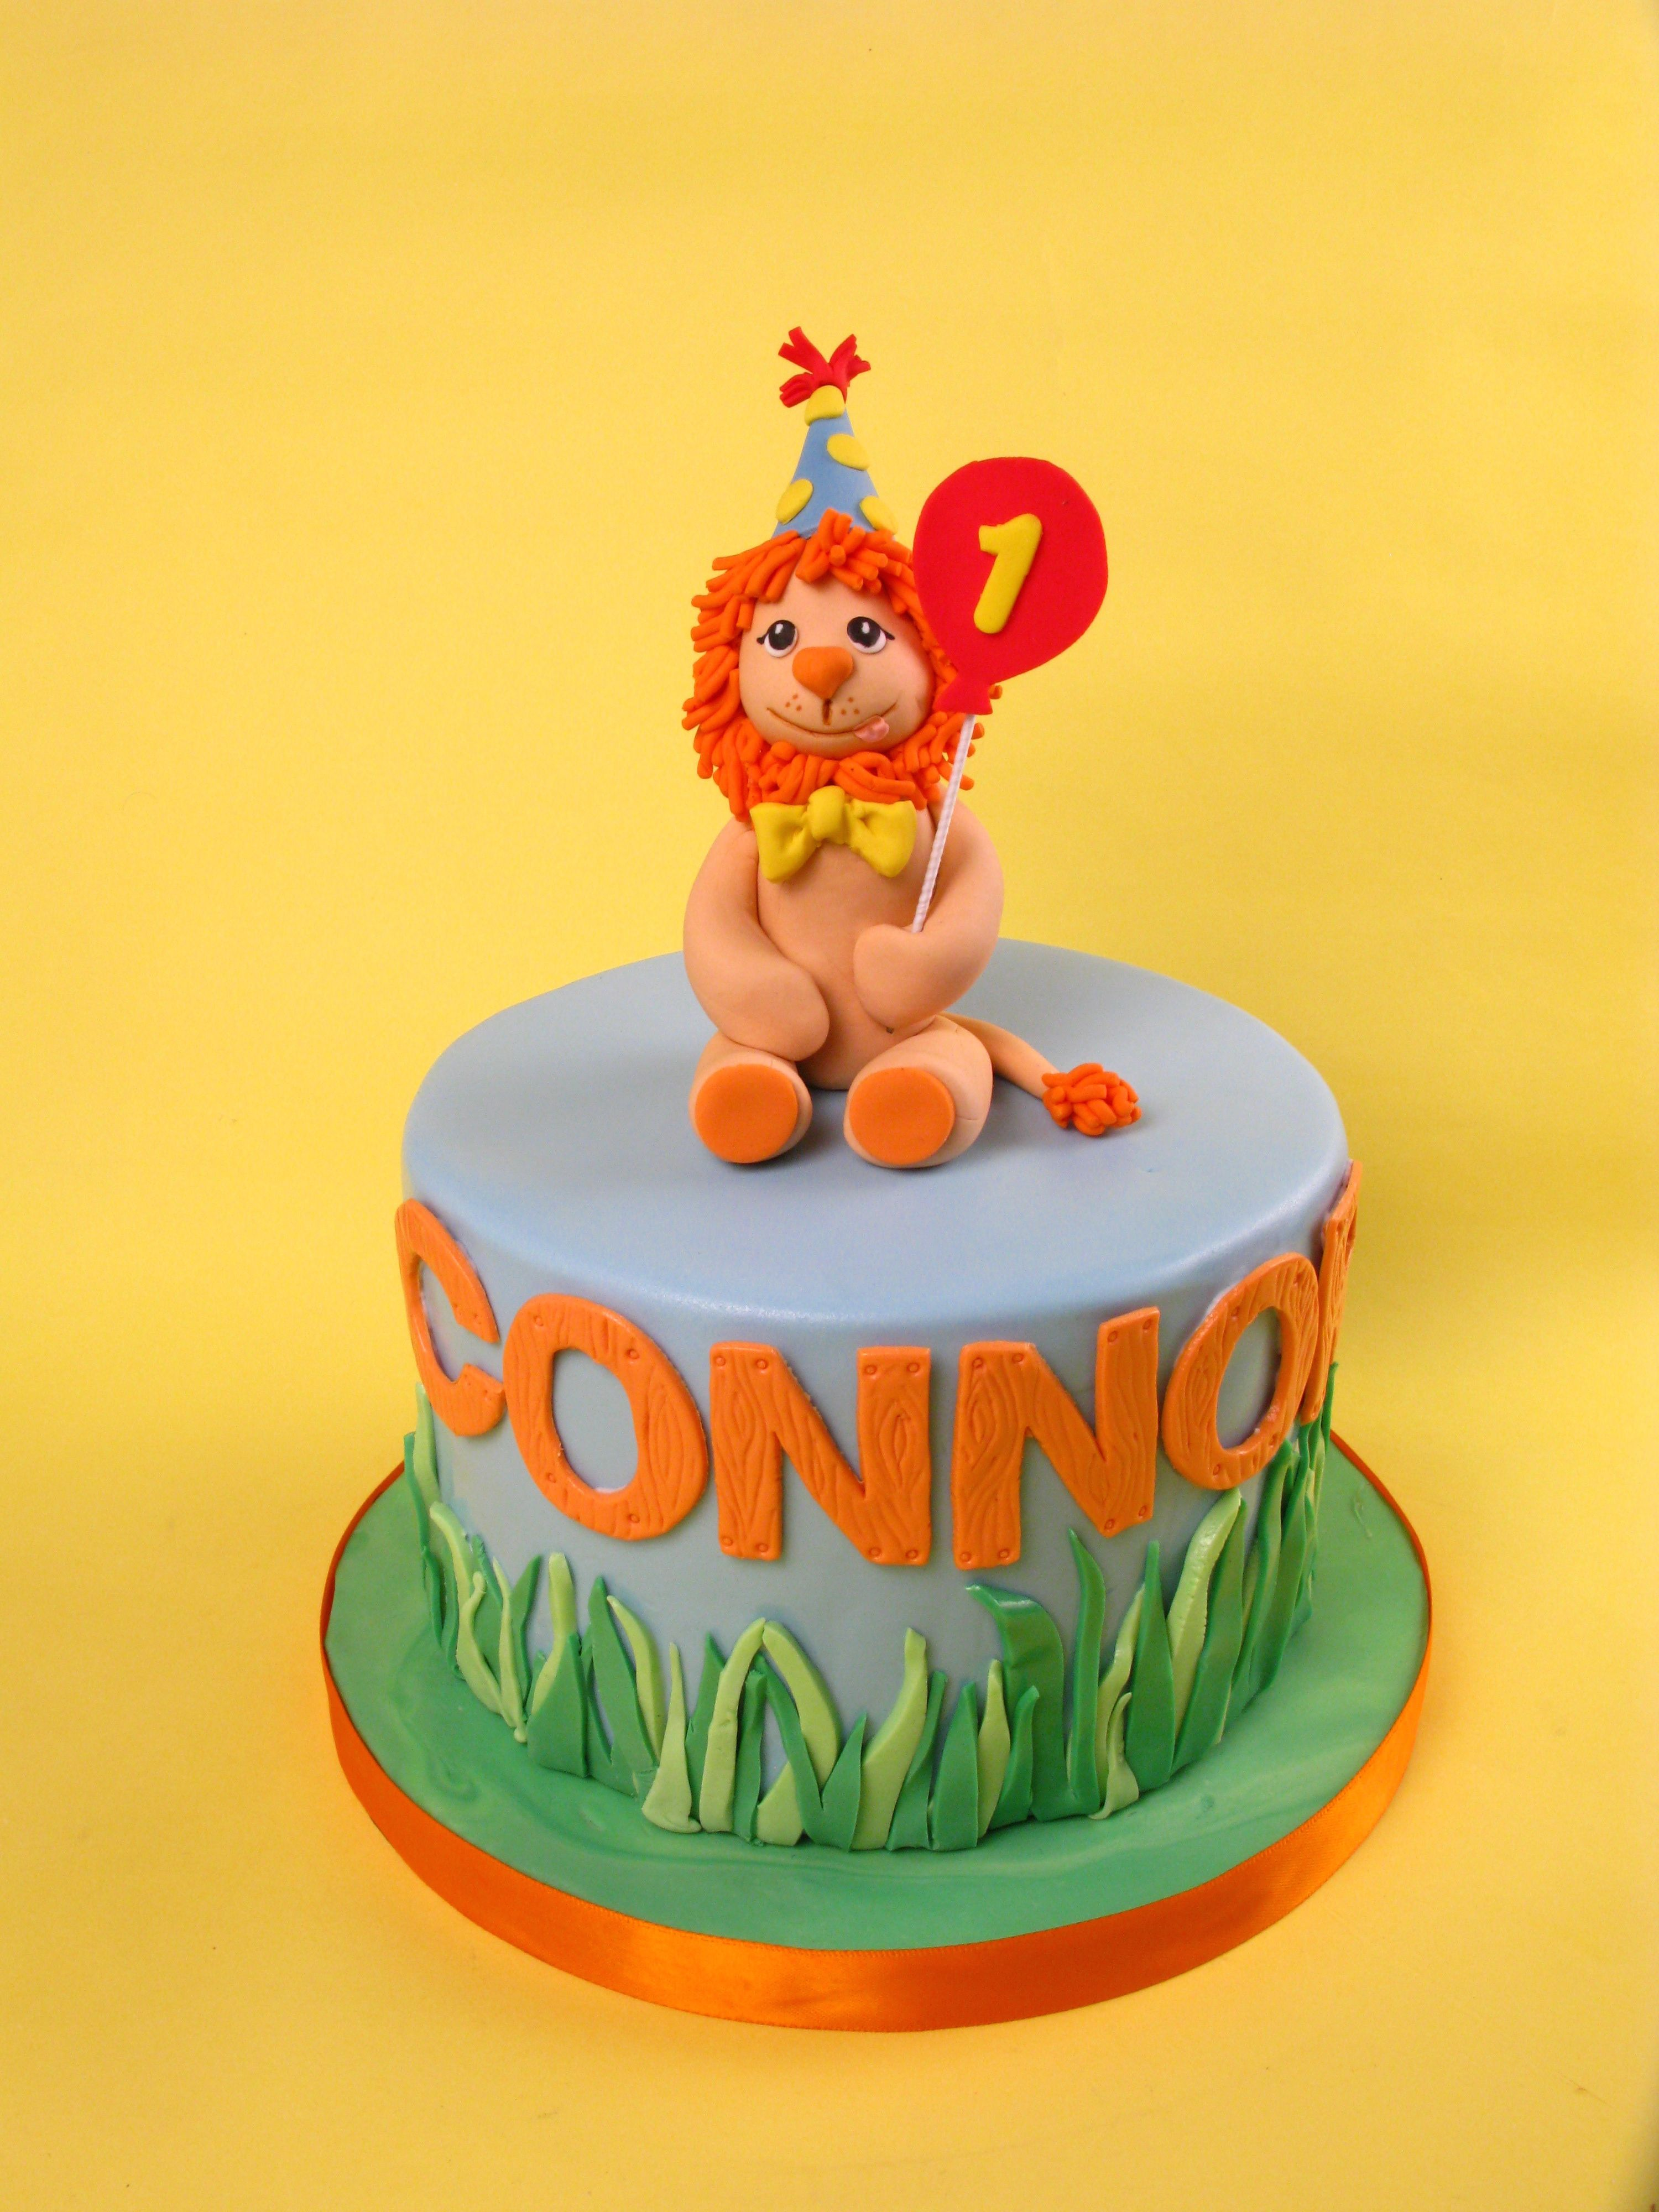 one year old cake first birthday cake lion cake lion cake